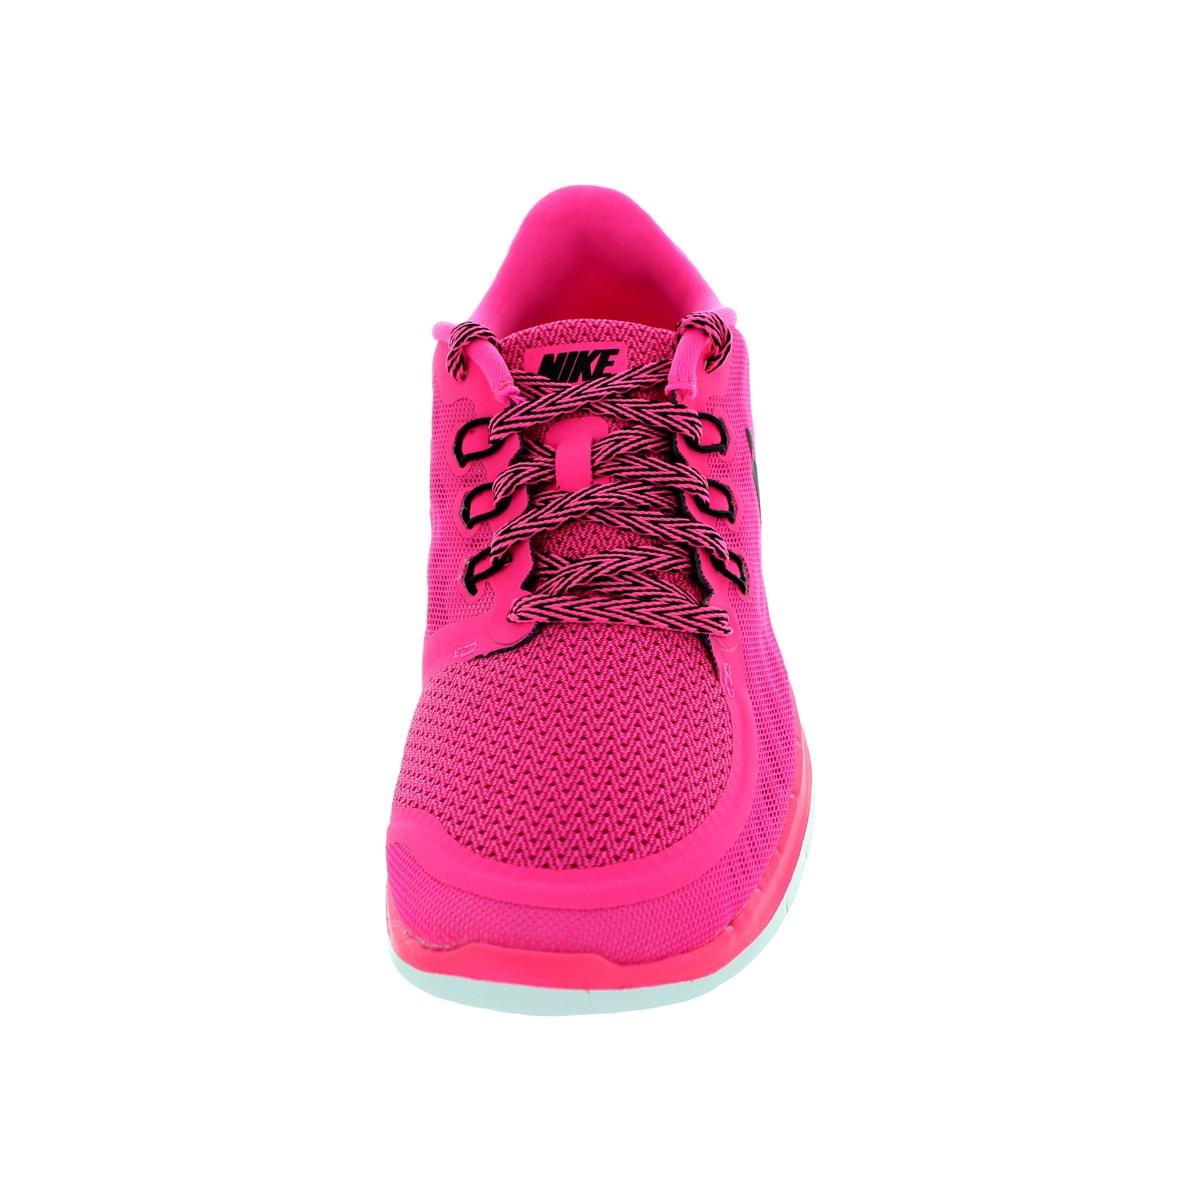 200e44c83 Shop Nike Kids Free 5.0 (Gs) Pink Pow Black Vivid Pink White Running Shoe -  Free Shipping Today - Overstock - 12330617